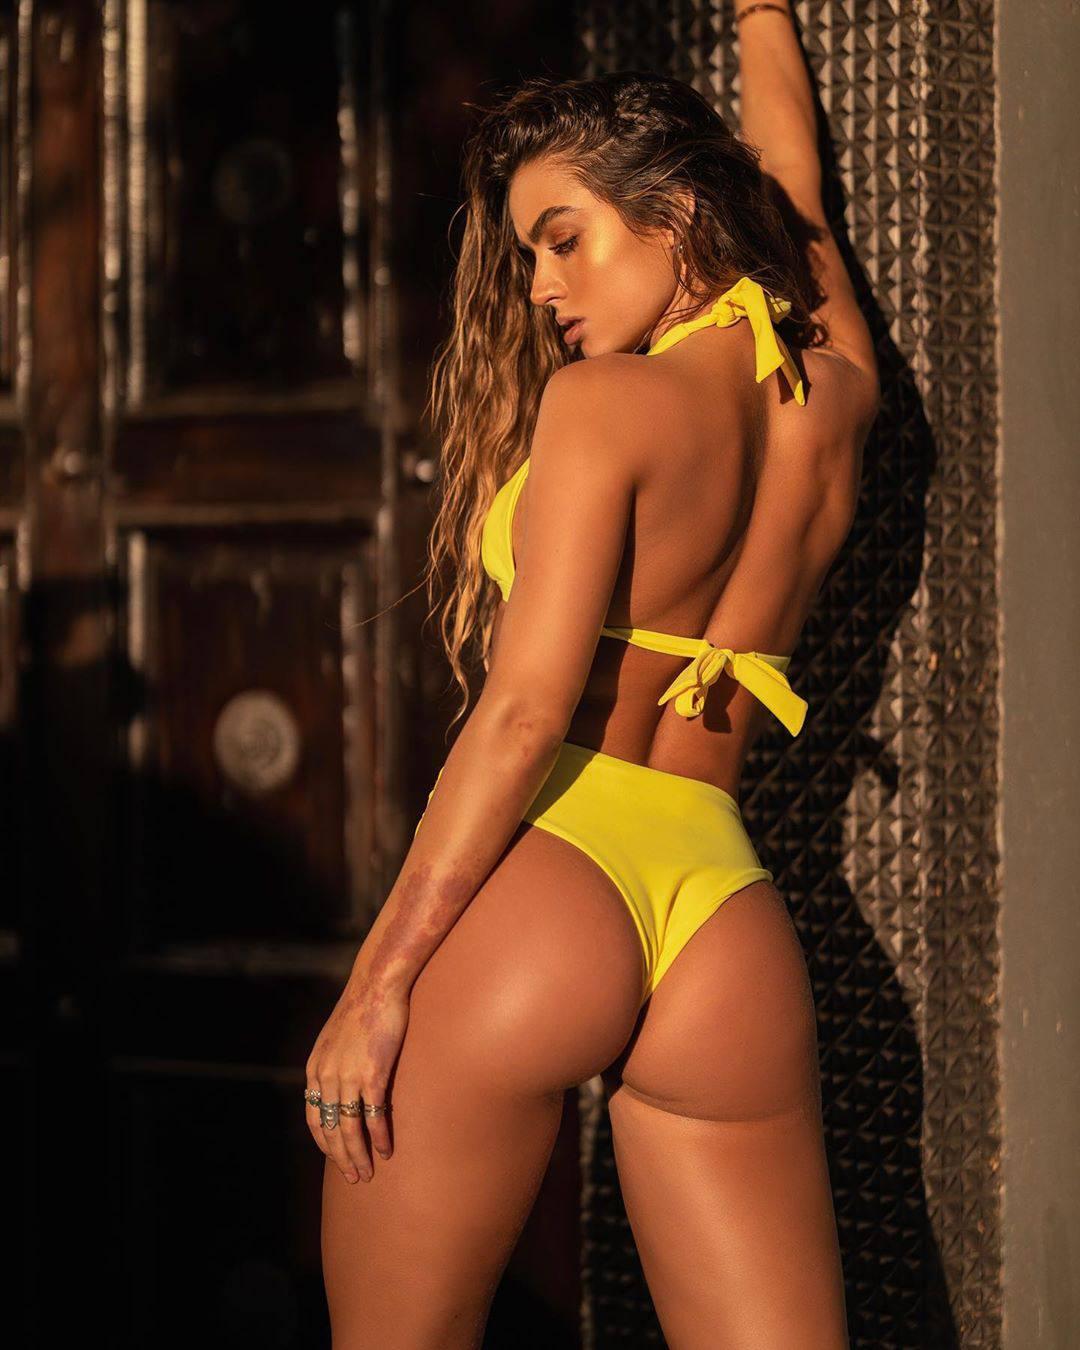 Sommer Ray Sexy Bikini Body